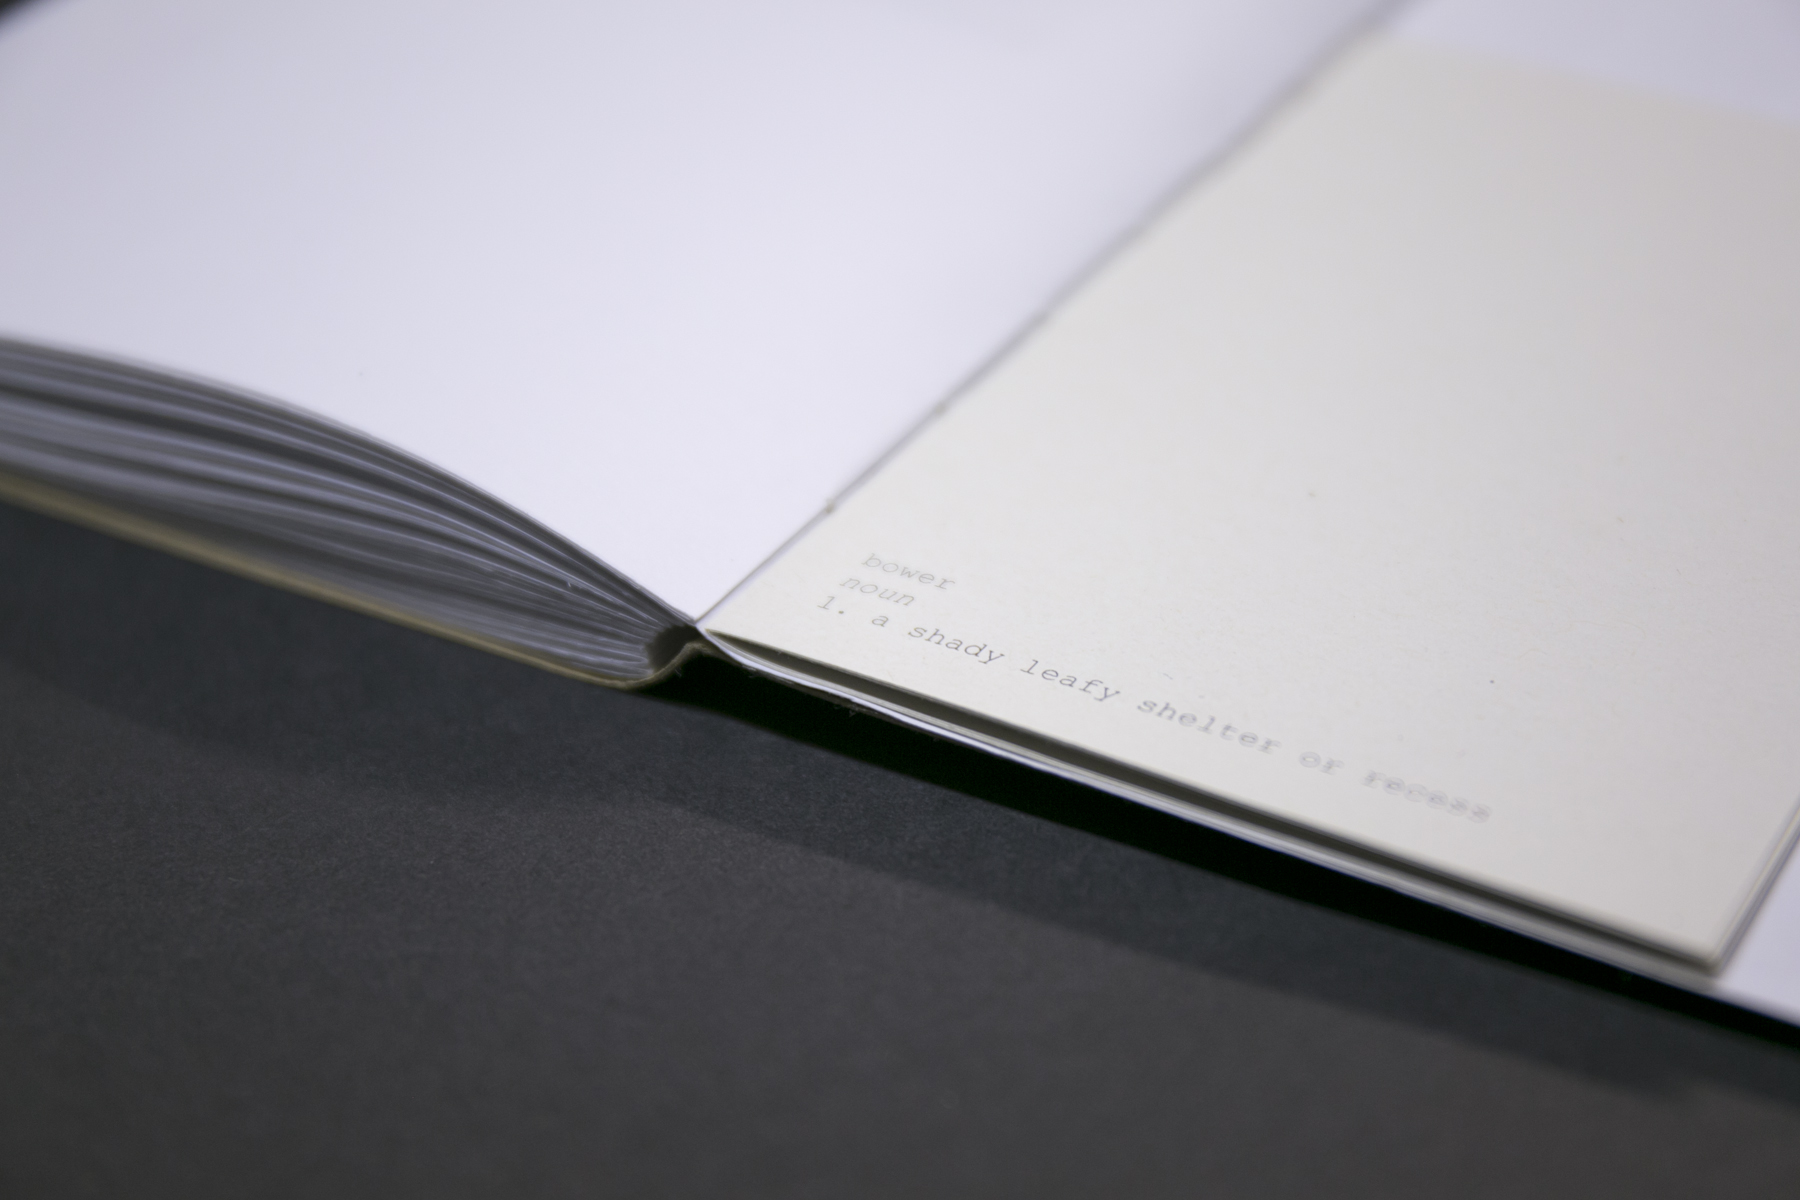 abowerforsisters-book-23.jpg